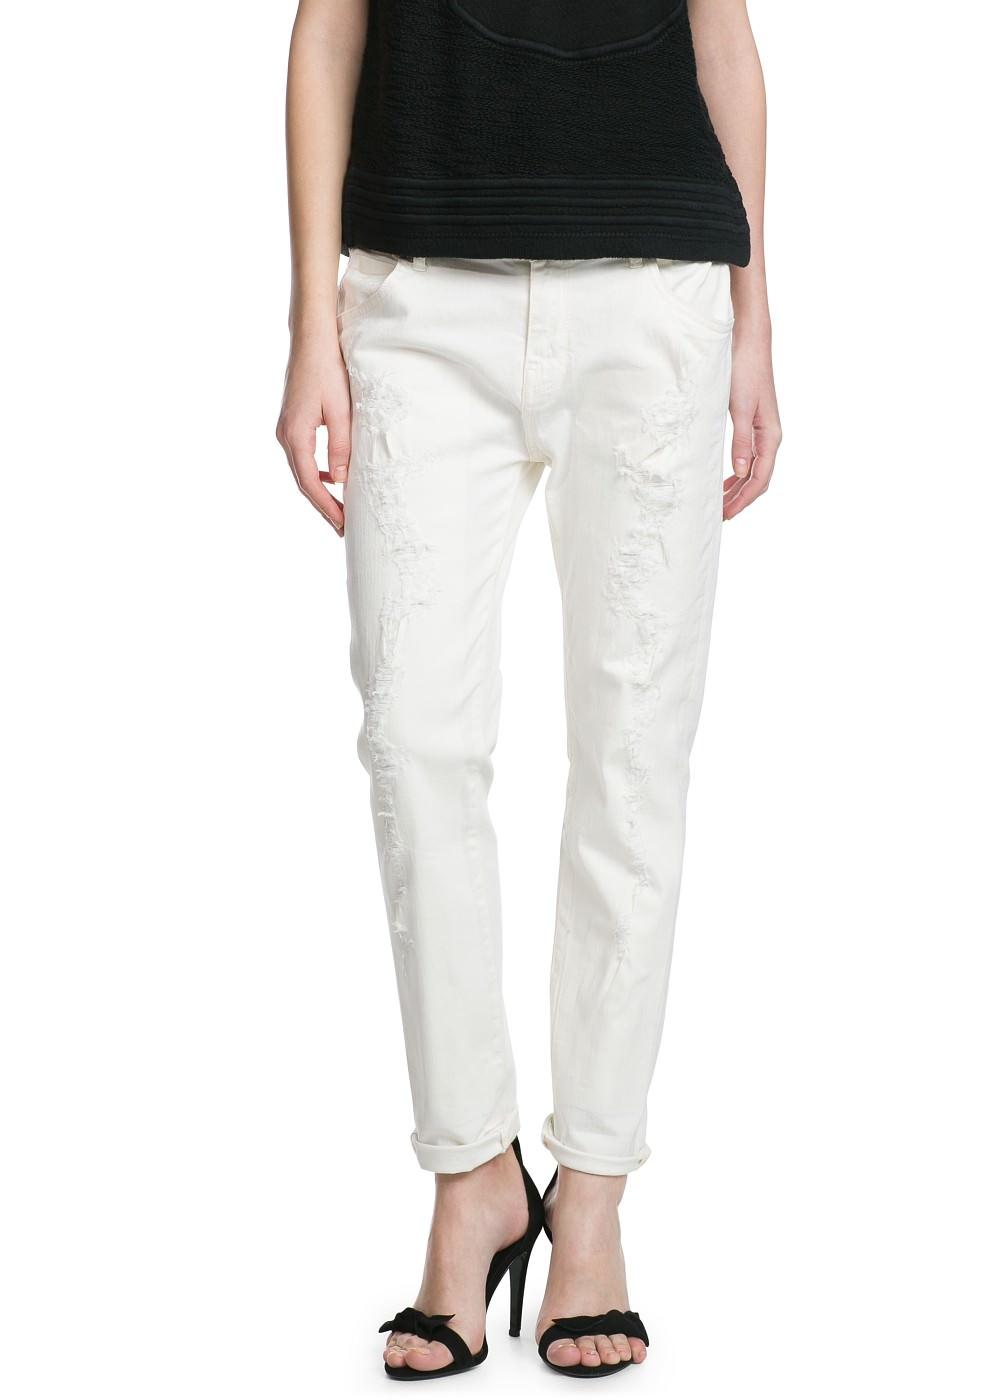 MANGO - CLOTHING - Jeans - Boyfriend Lonny jeans